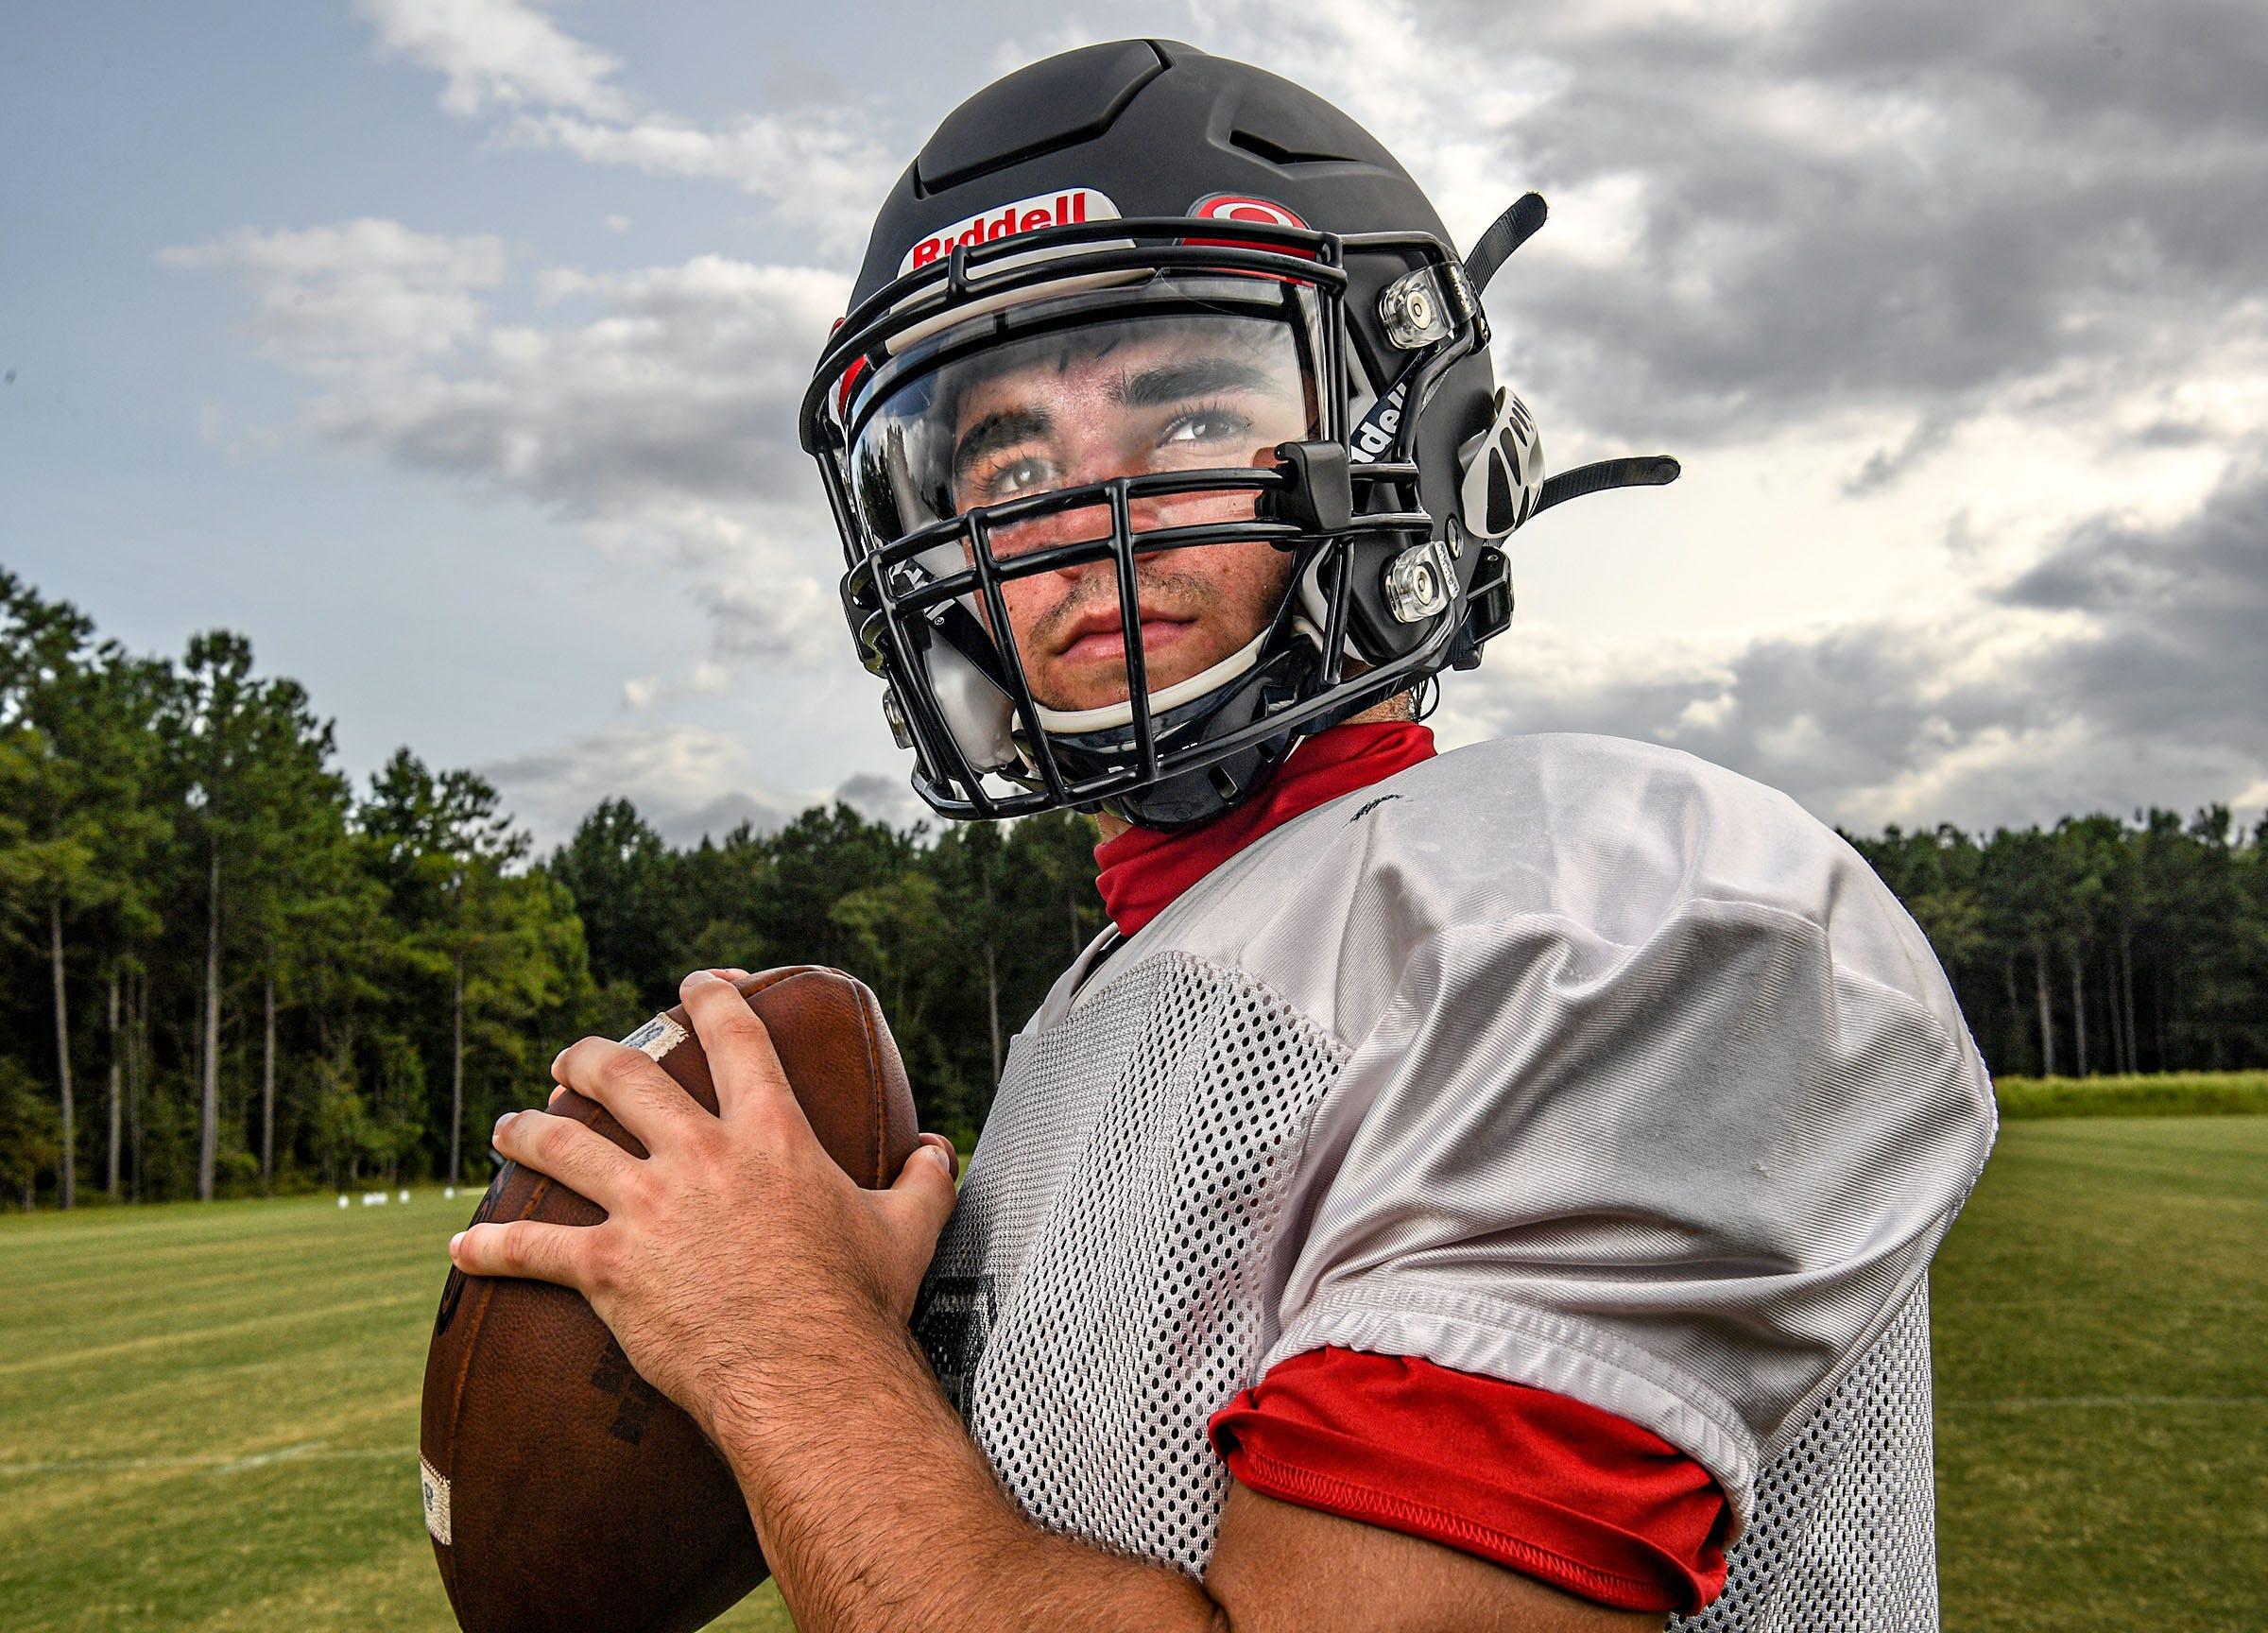 Belton-Honea Path football quarterback Tyler Fields in Honea Path, S.C. Wednesday, September 9, 2020.